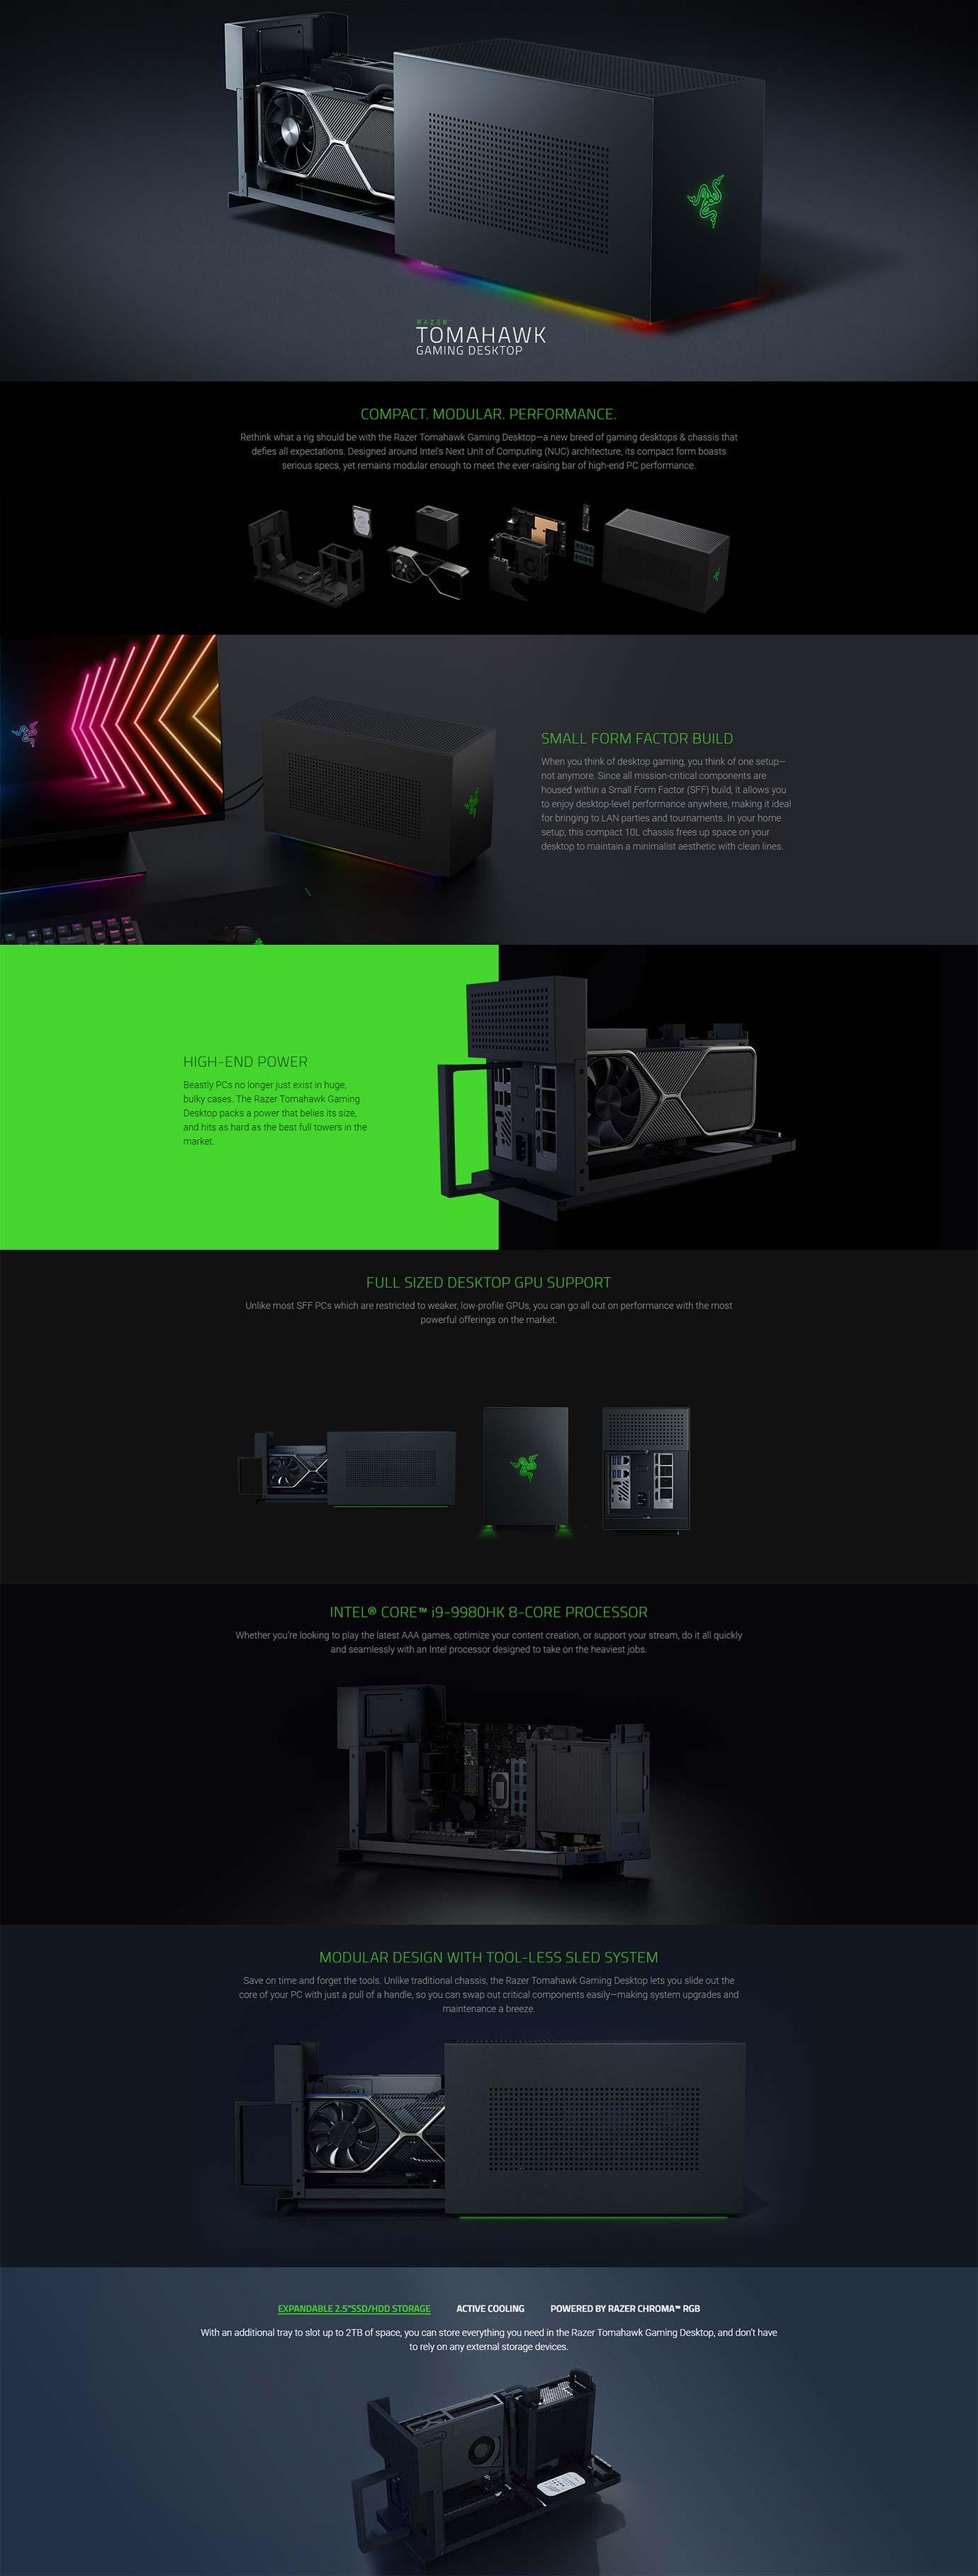 Razer Tomahawk Gaming Desktop i9-9980HK 16GB RAM 512GB SSD +2TB HDD 750W Gaming Desktop